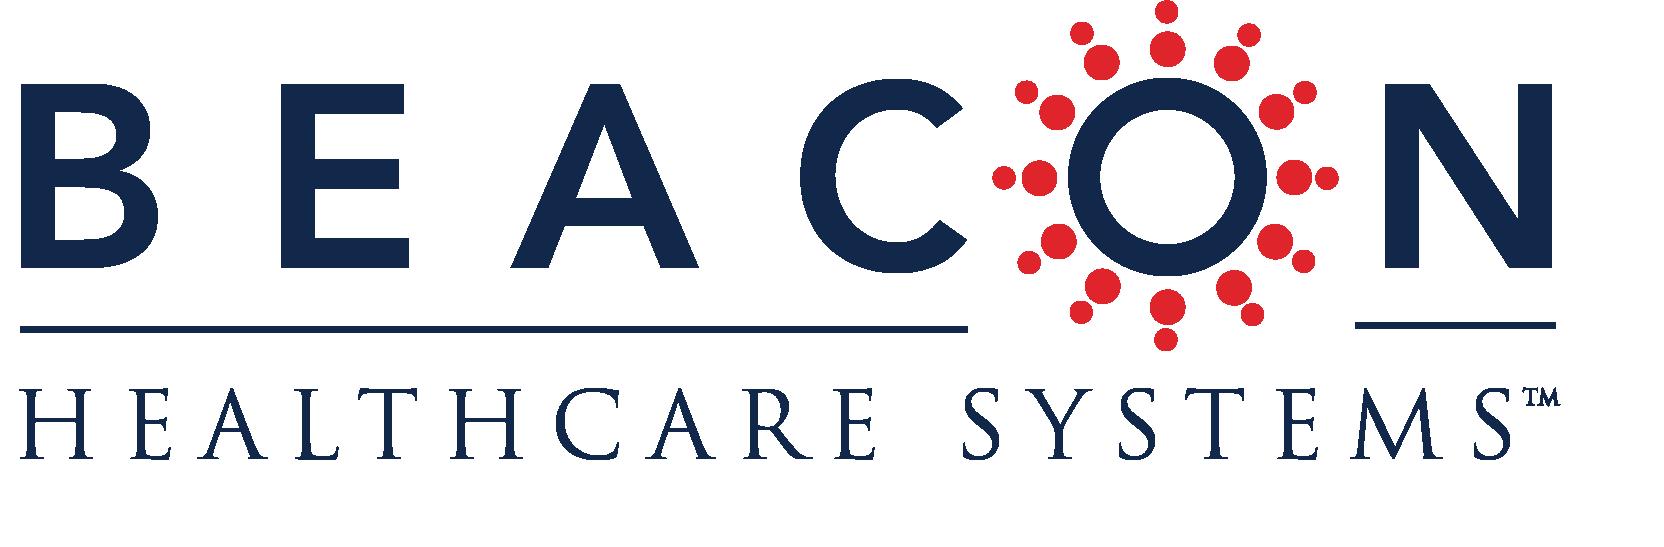 BeaconHealthcareSys Logo